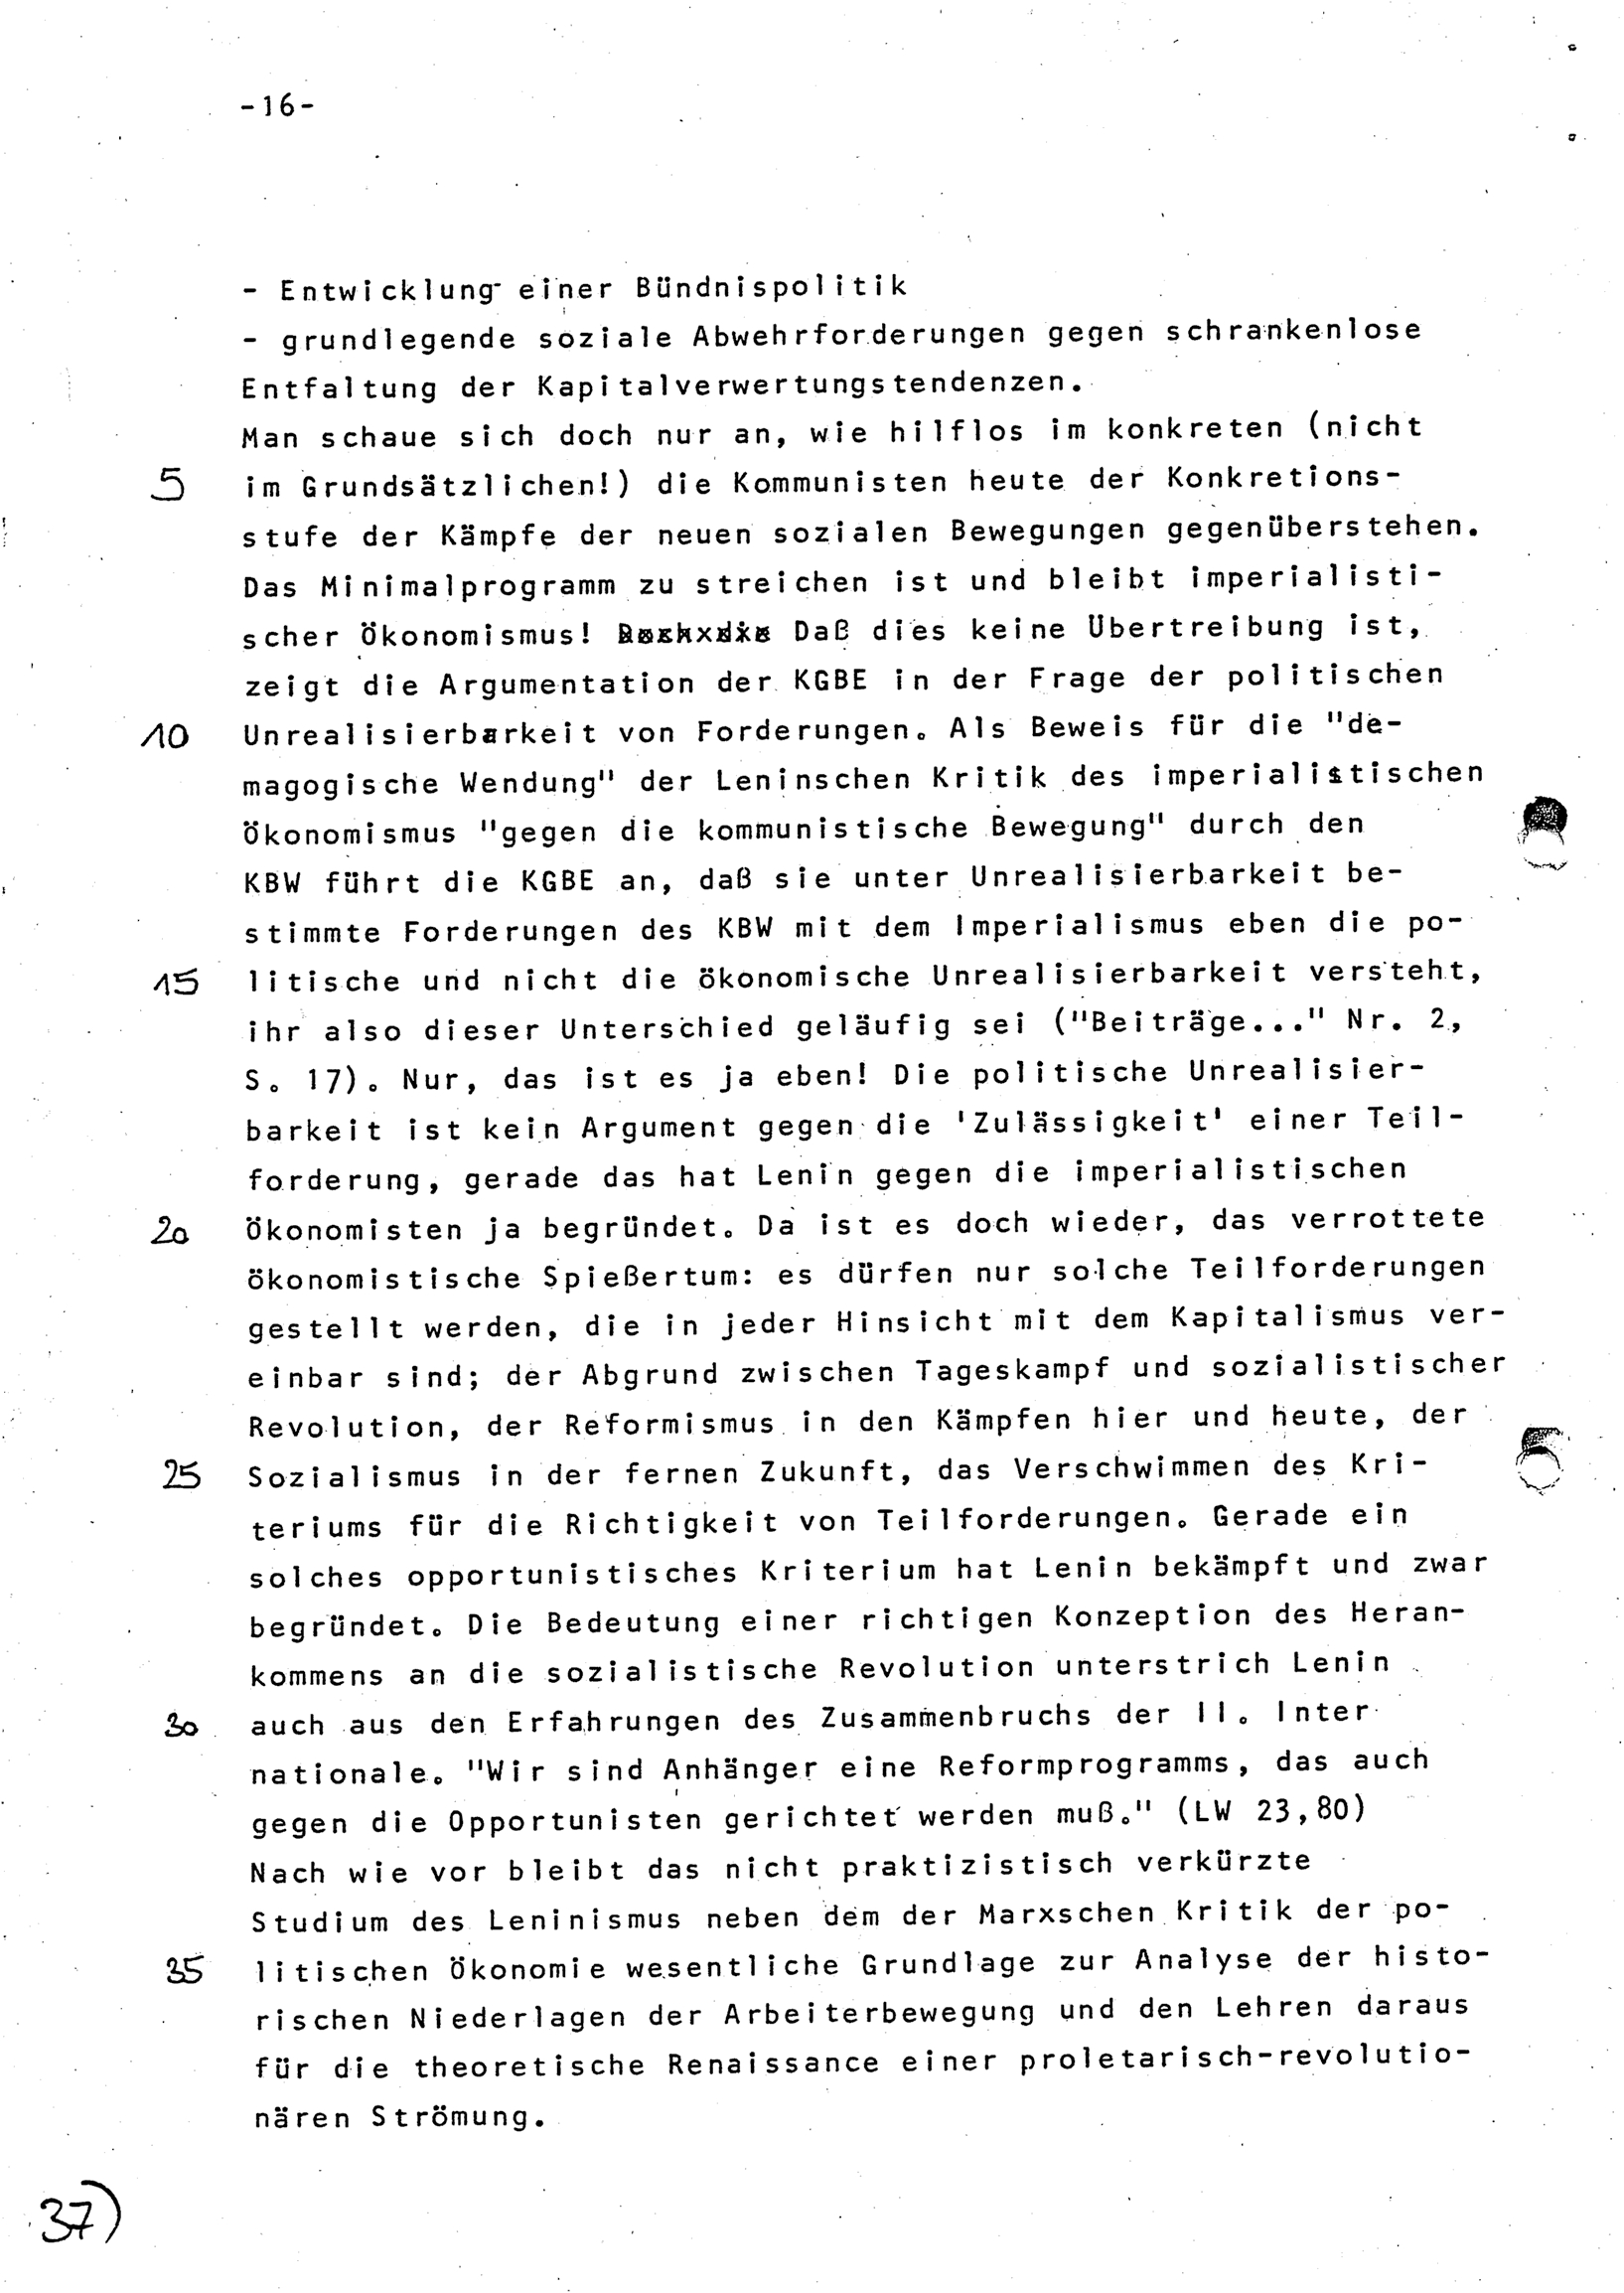 Ulm_KGU_Arbeitsheft_19830425_015_040